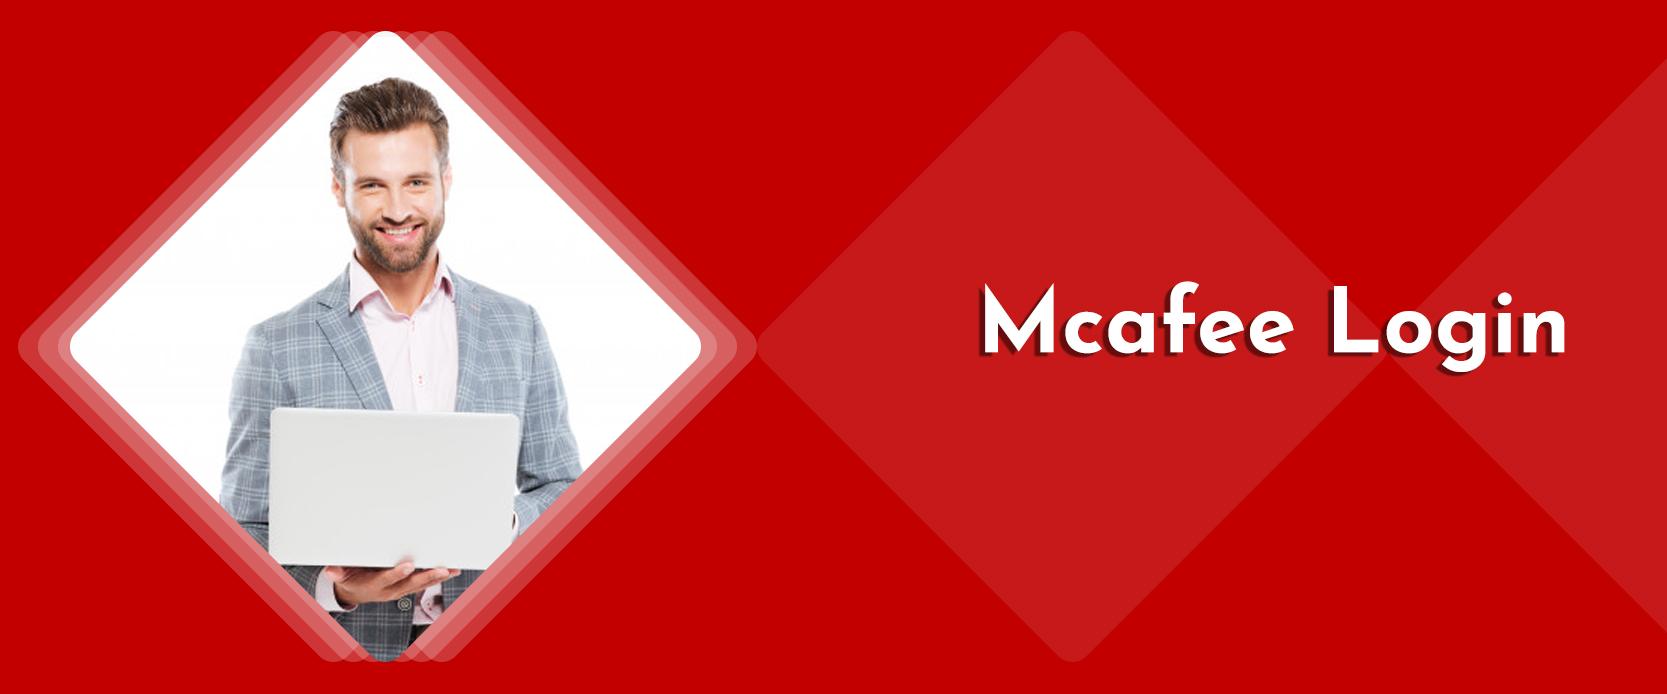 McAfee Login